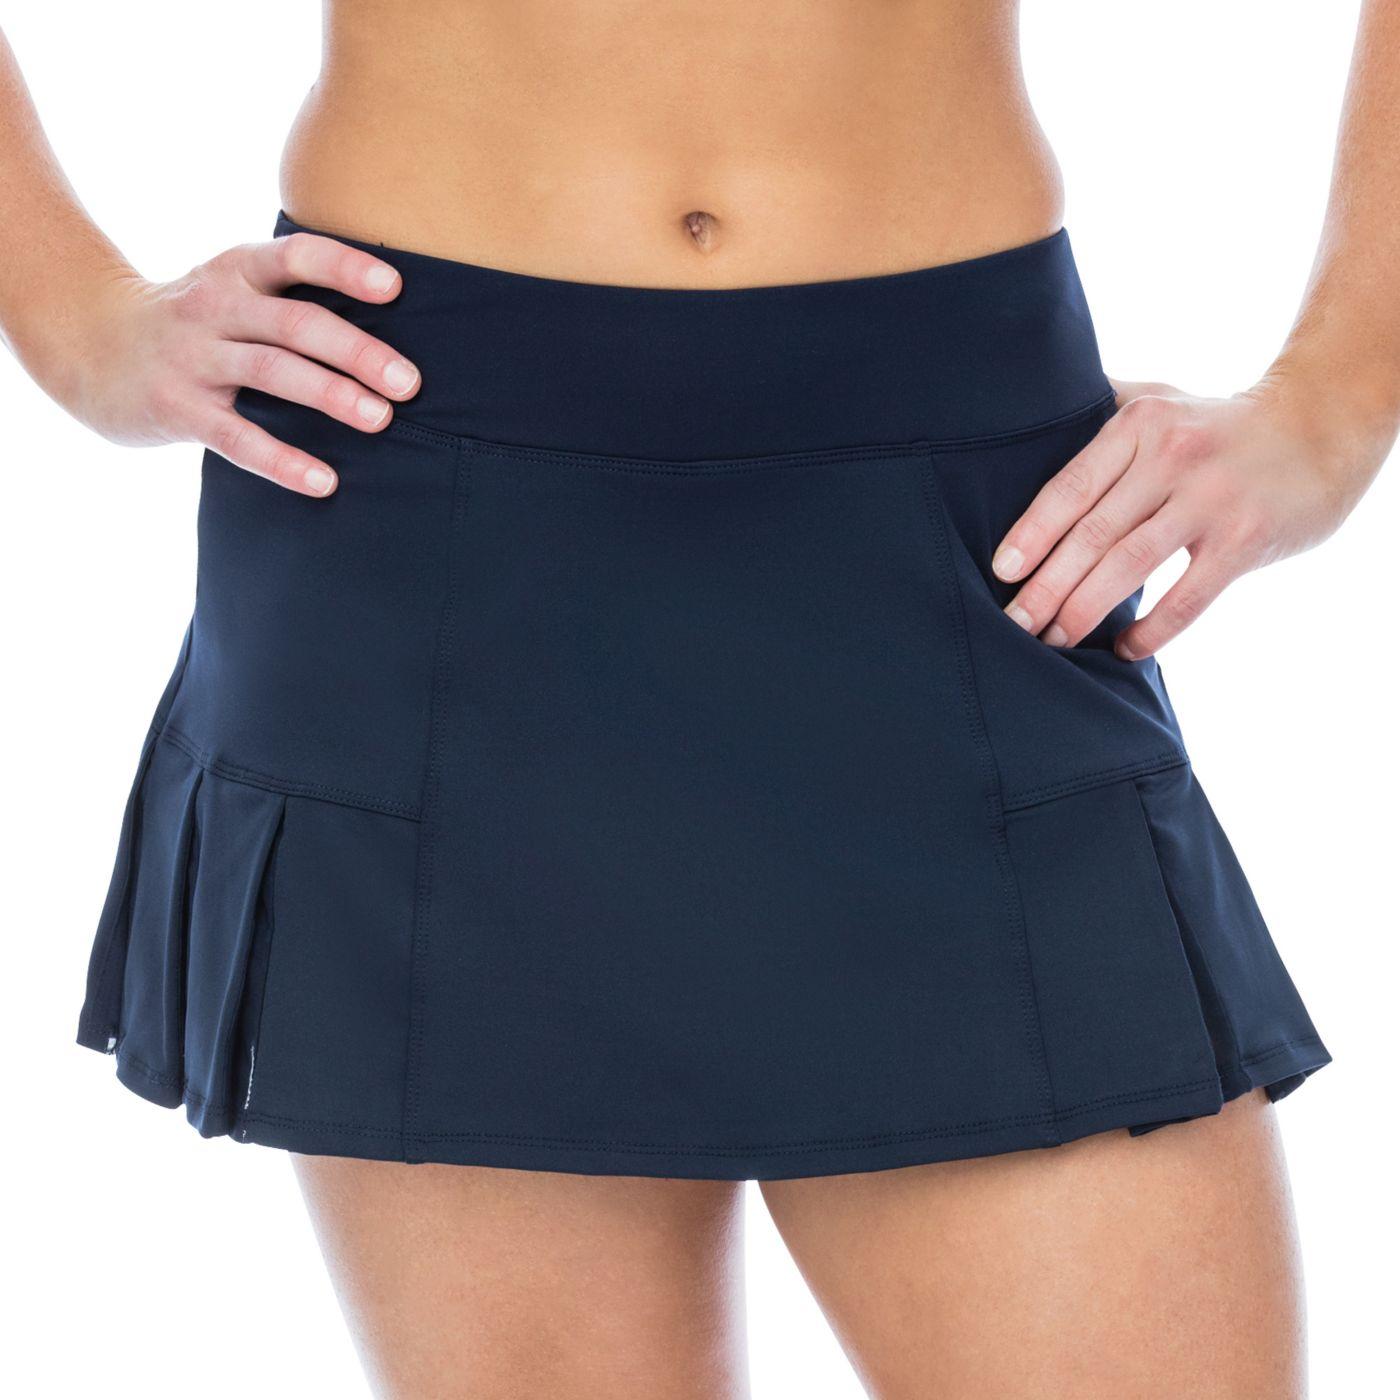 Fila Women's Pleated Bottom Tennis Skort